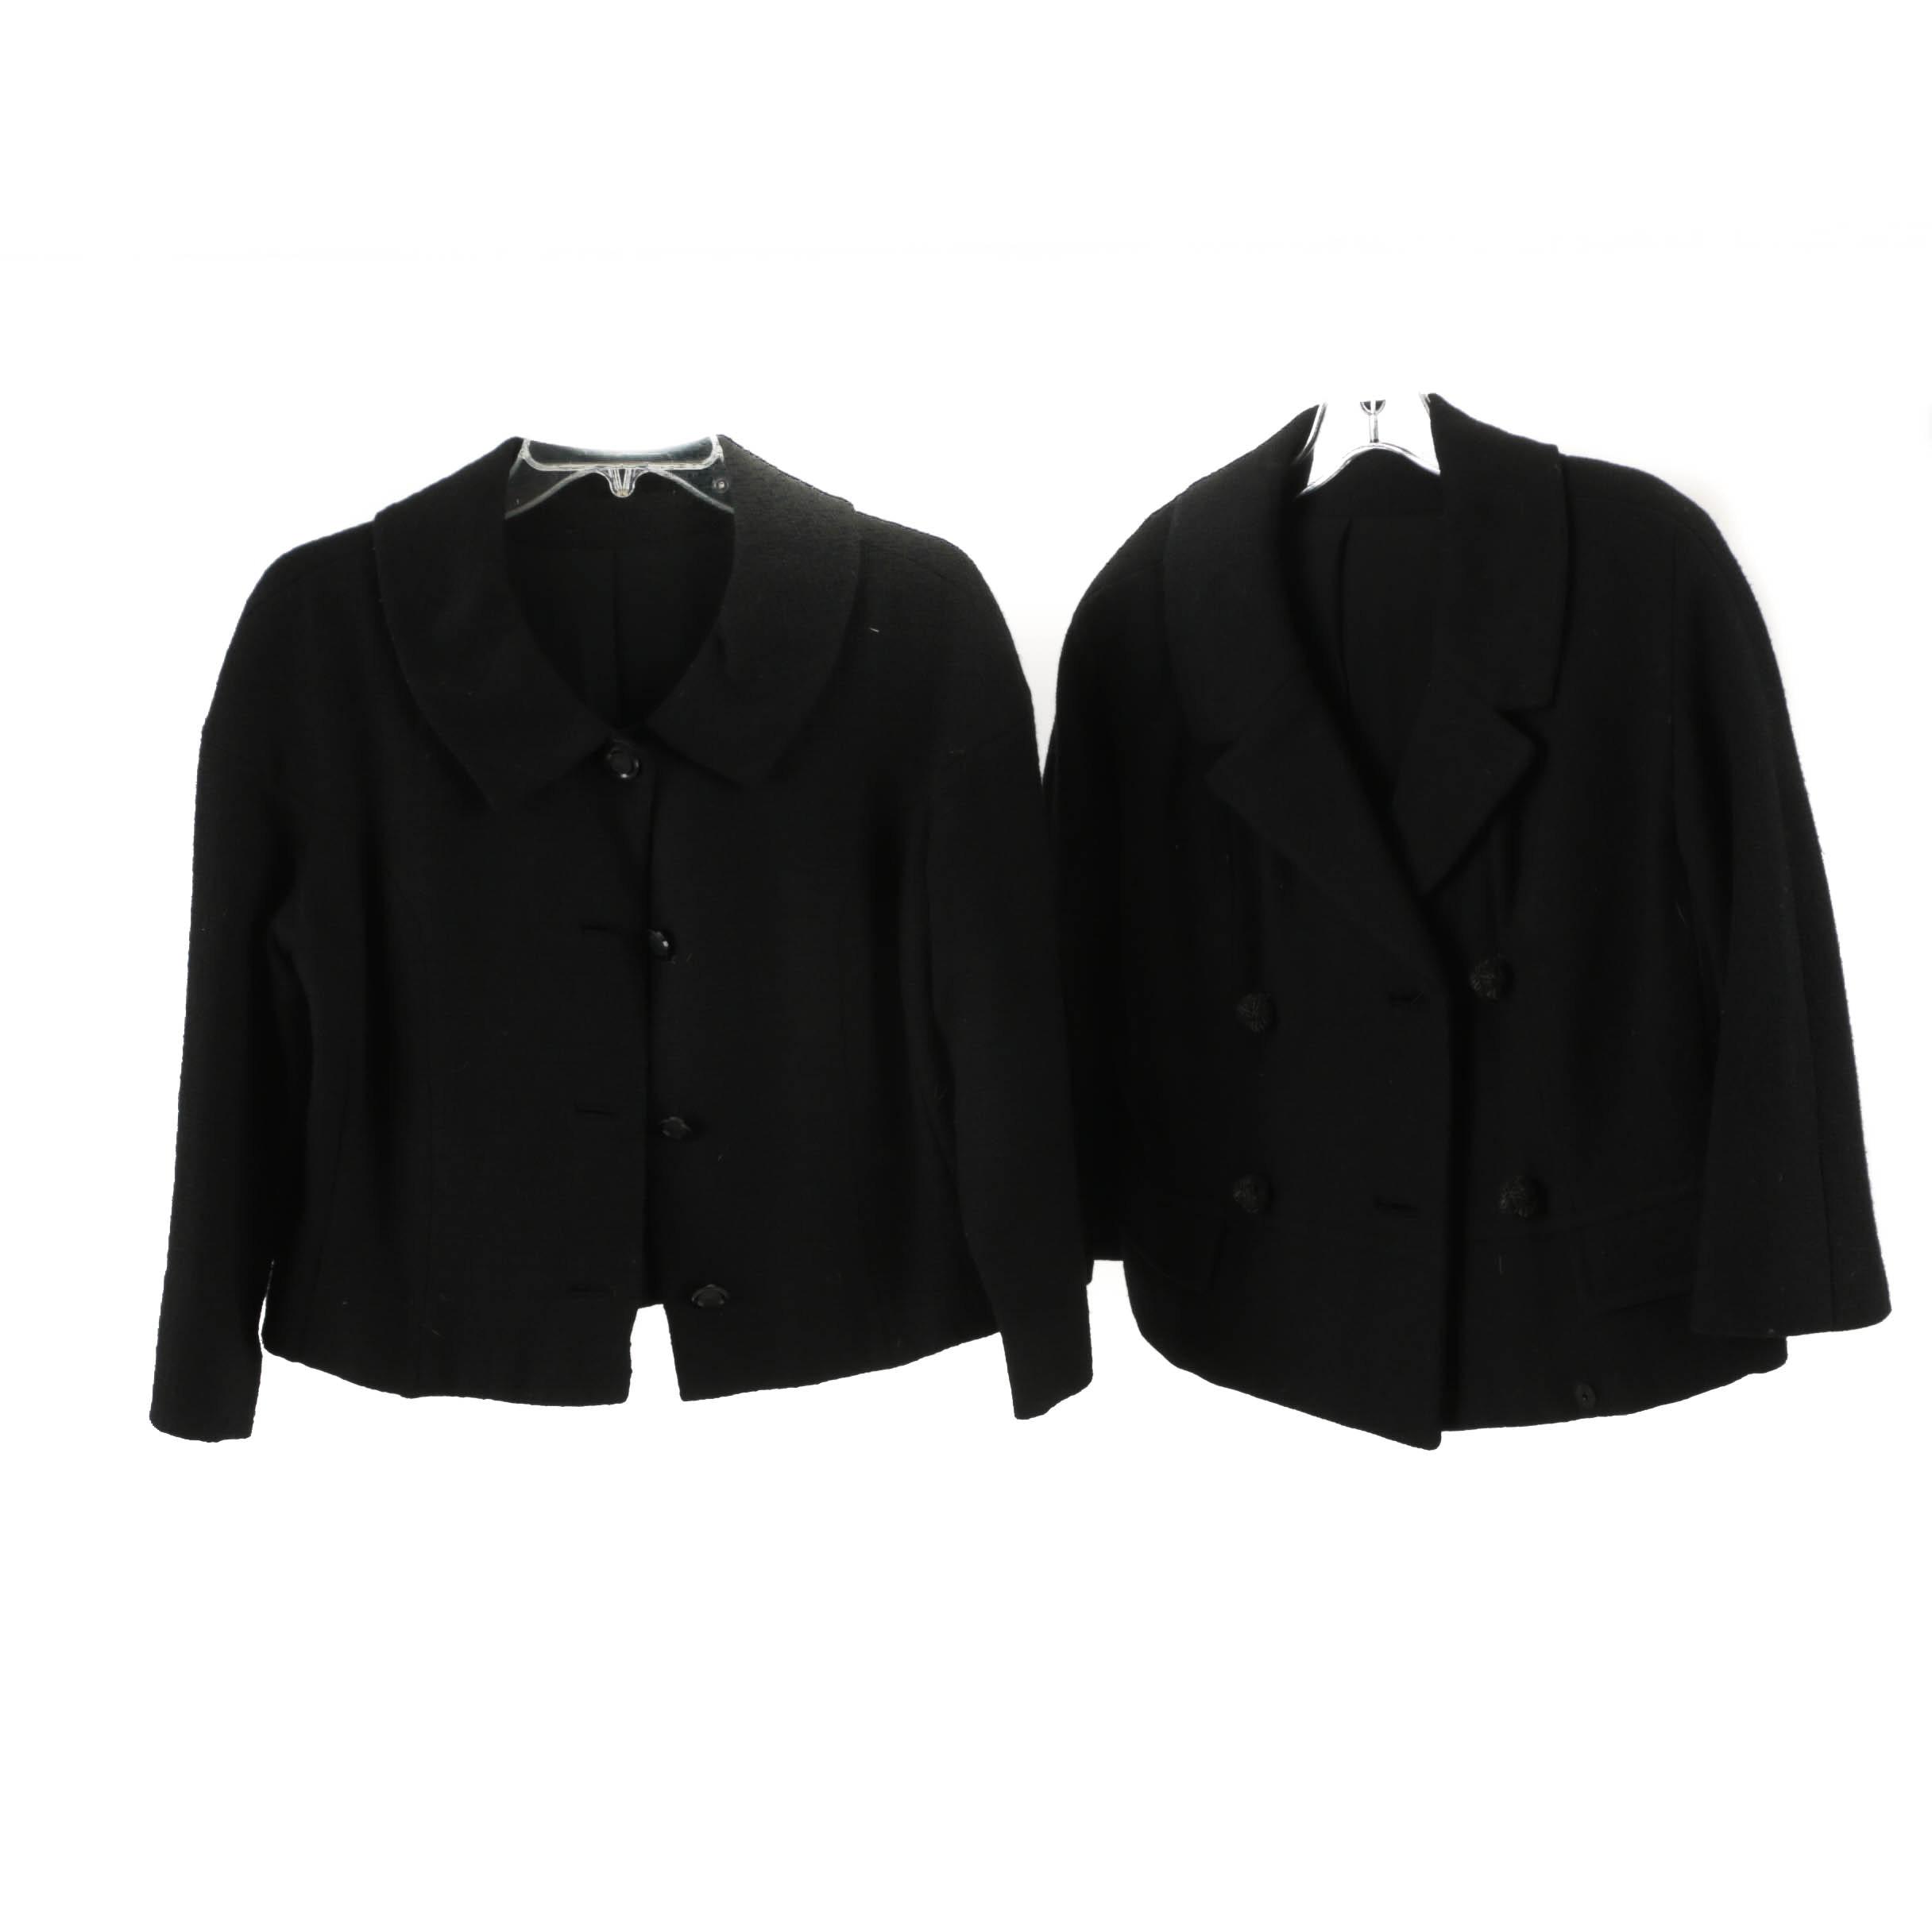 Women's 1960s Vintage Jackets